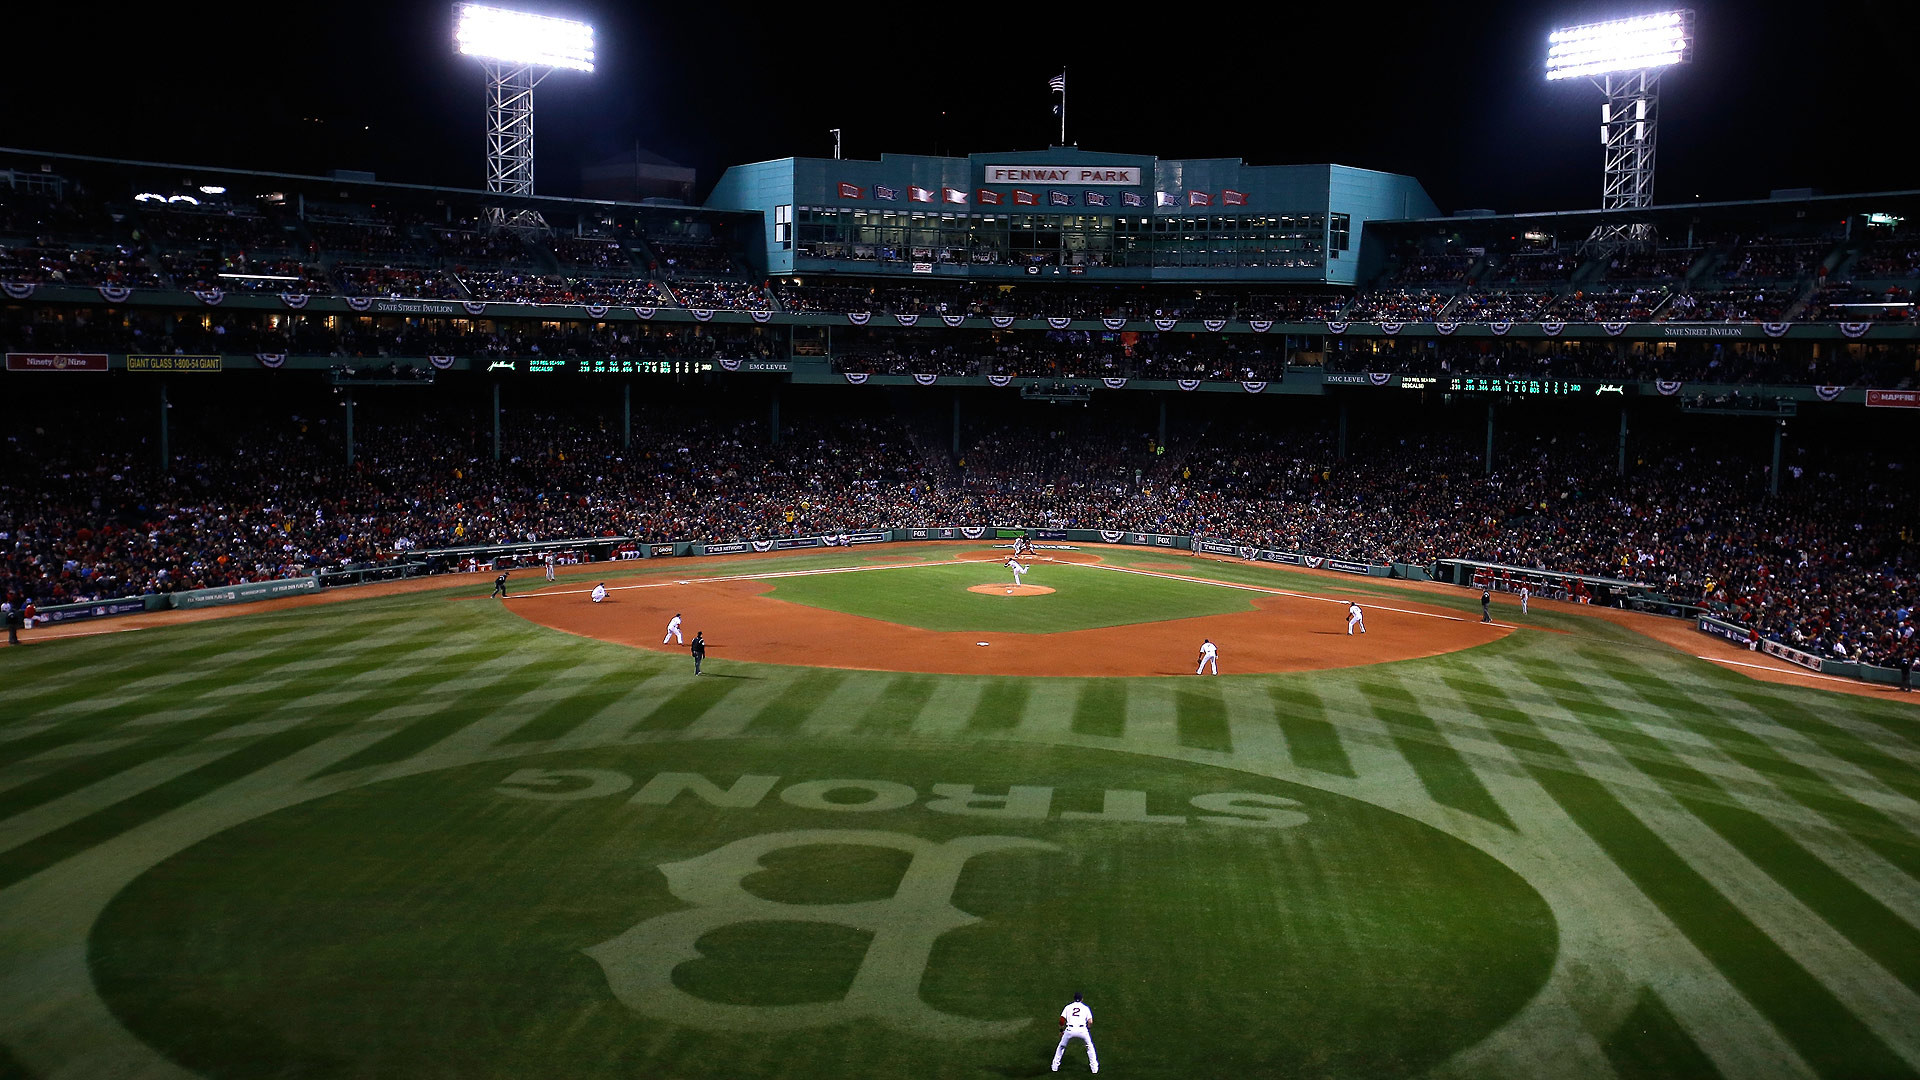 Red Sox Desktop Wallpaper the best 66 images in 2018 1920x1080